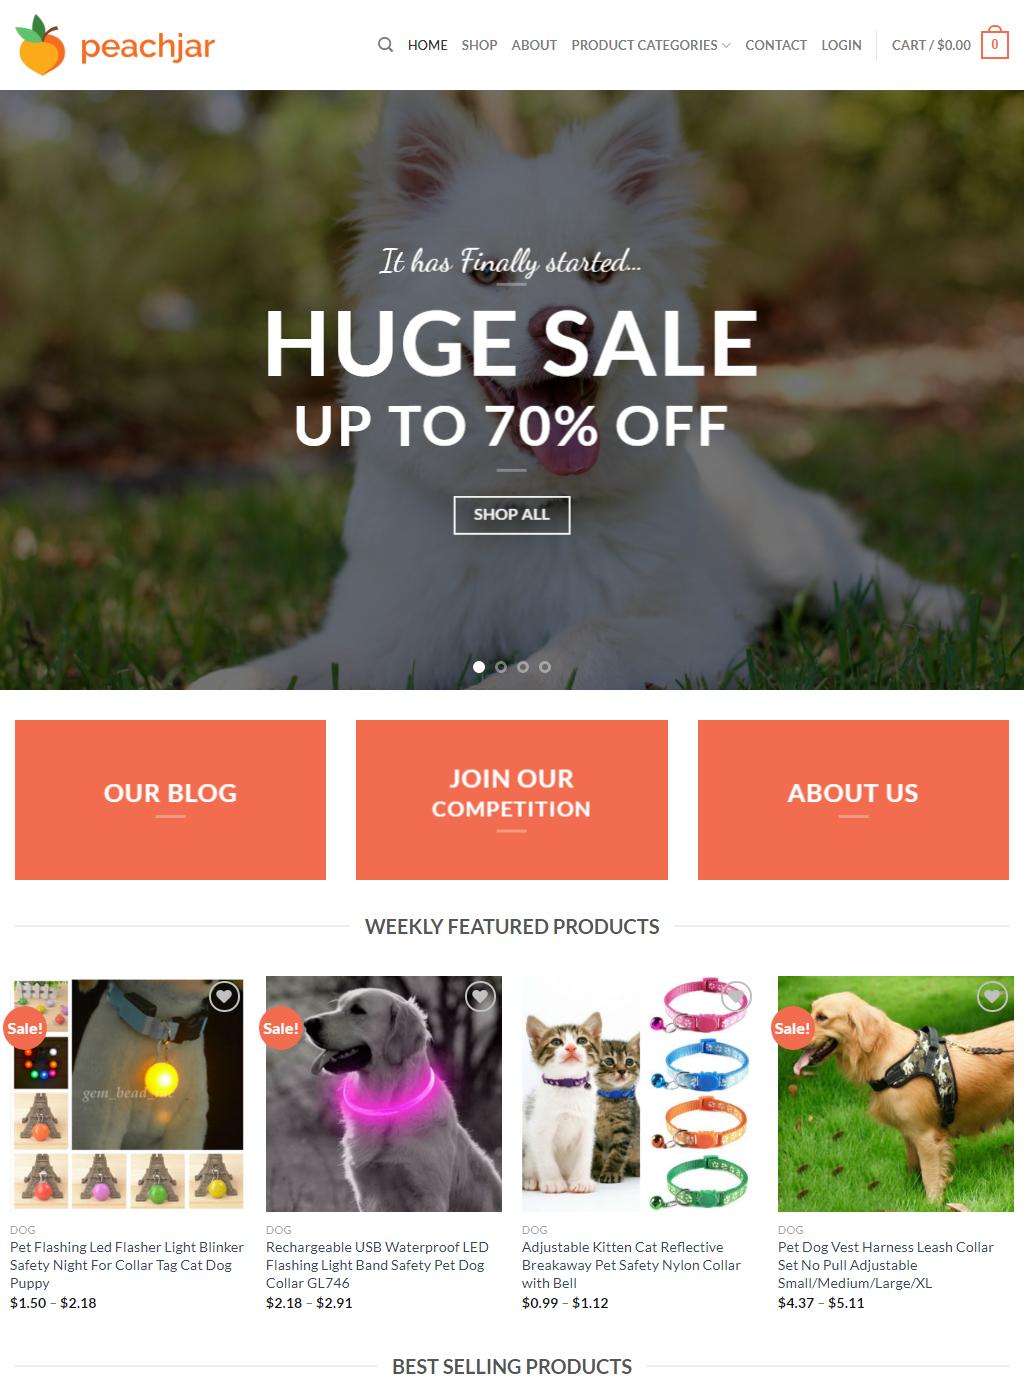 create ecommerce website using woocommerce in wordpress